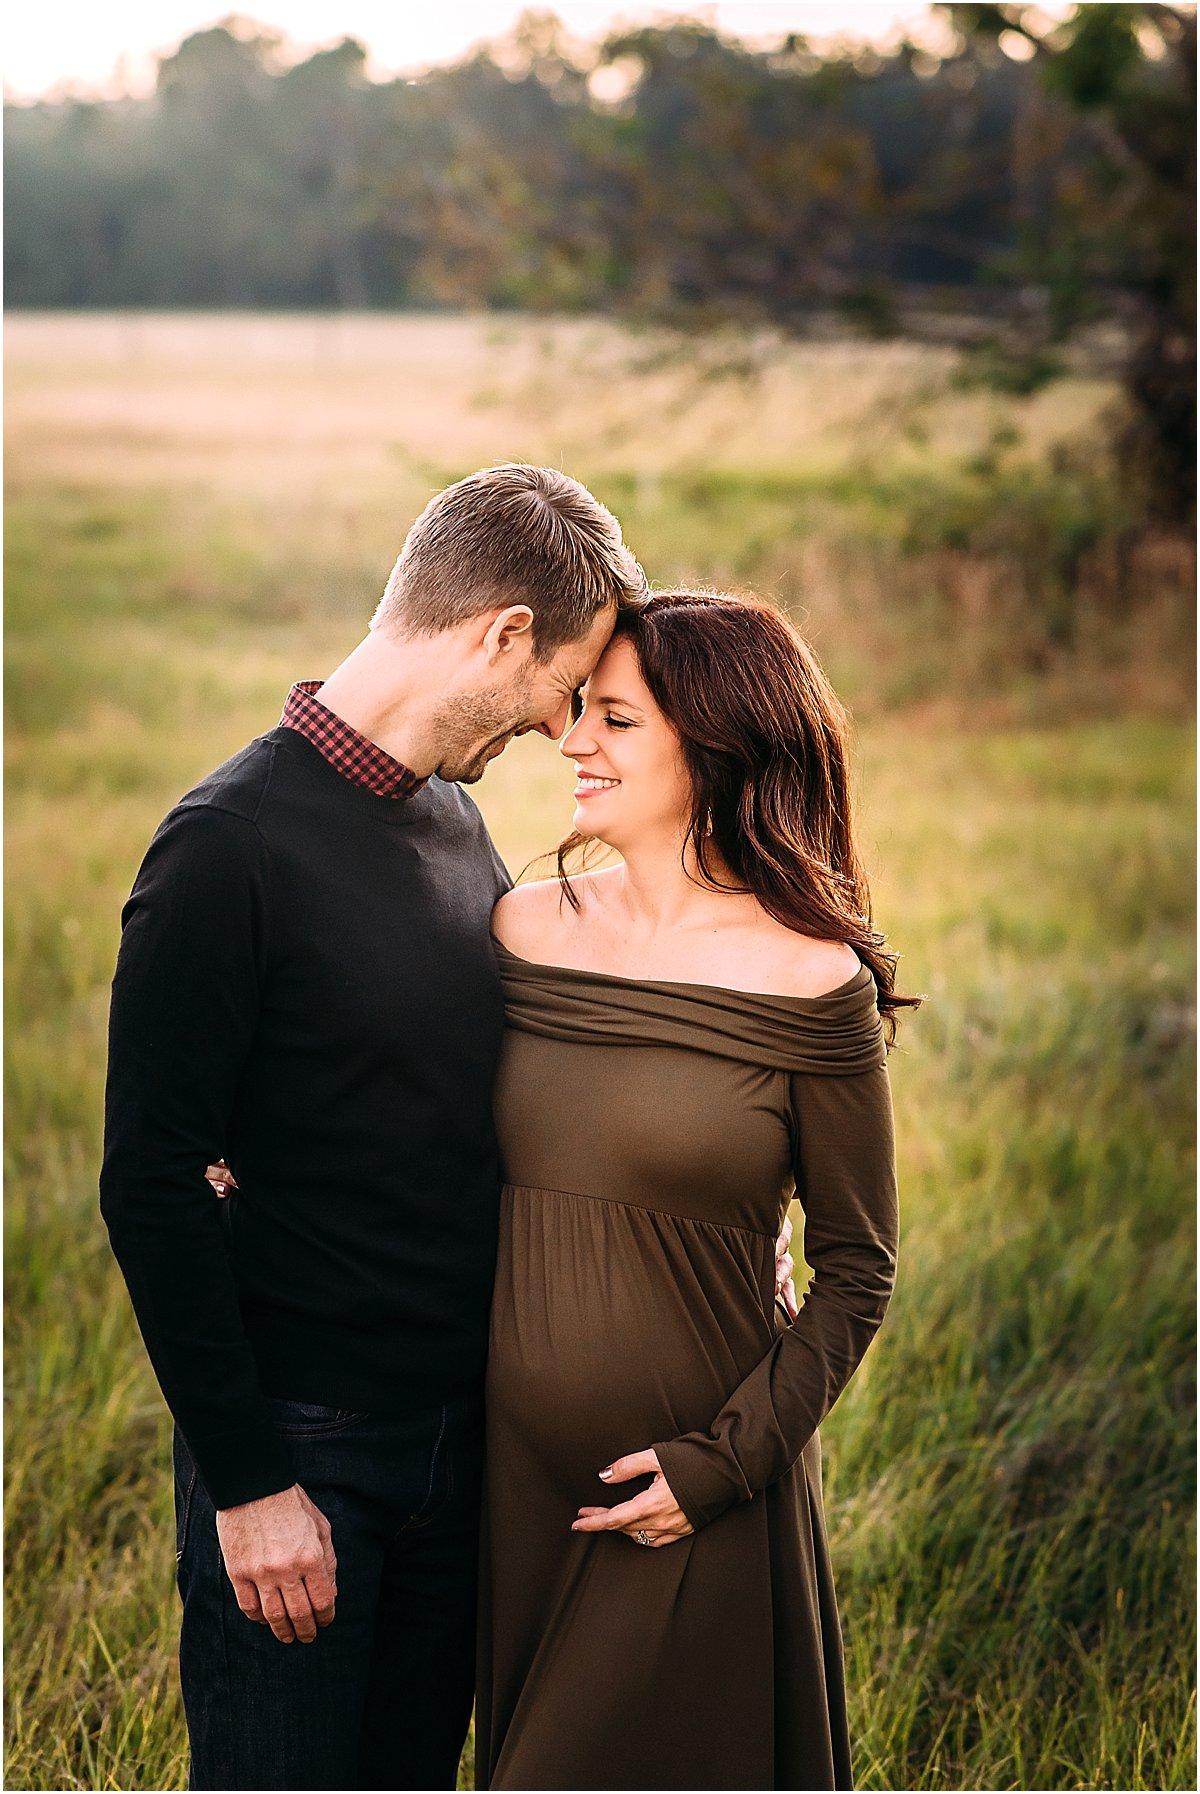 stunning couple maternity photos | Central Florida Family Photographer